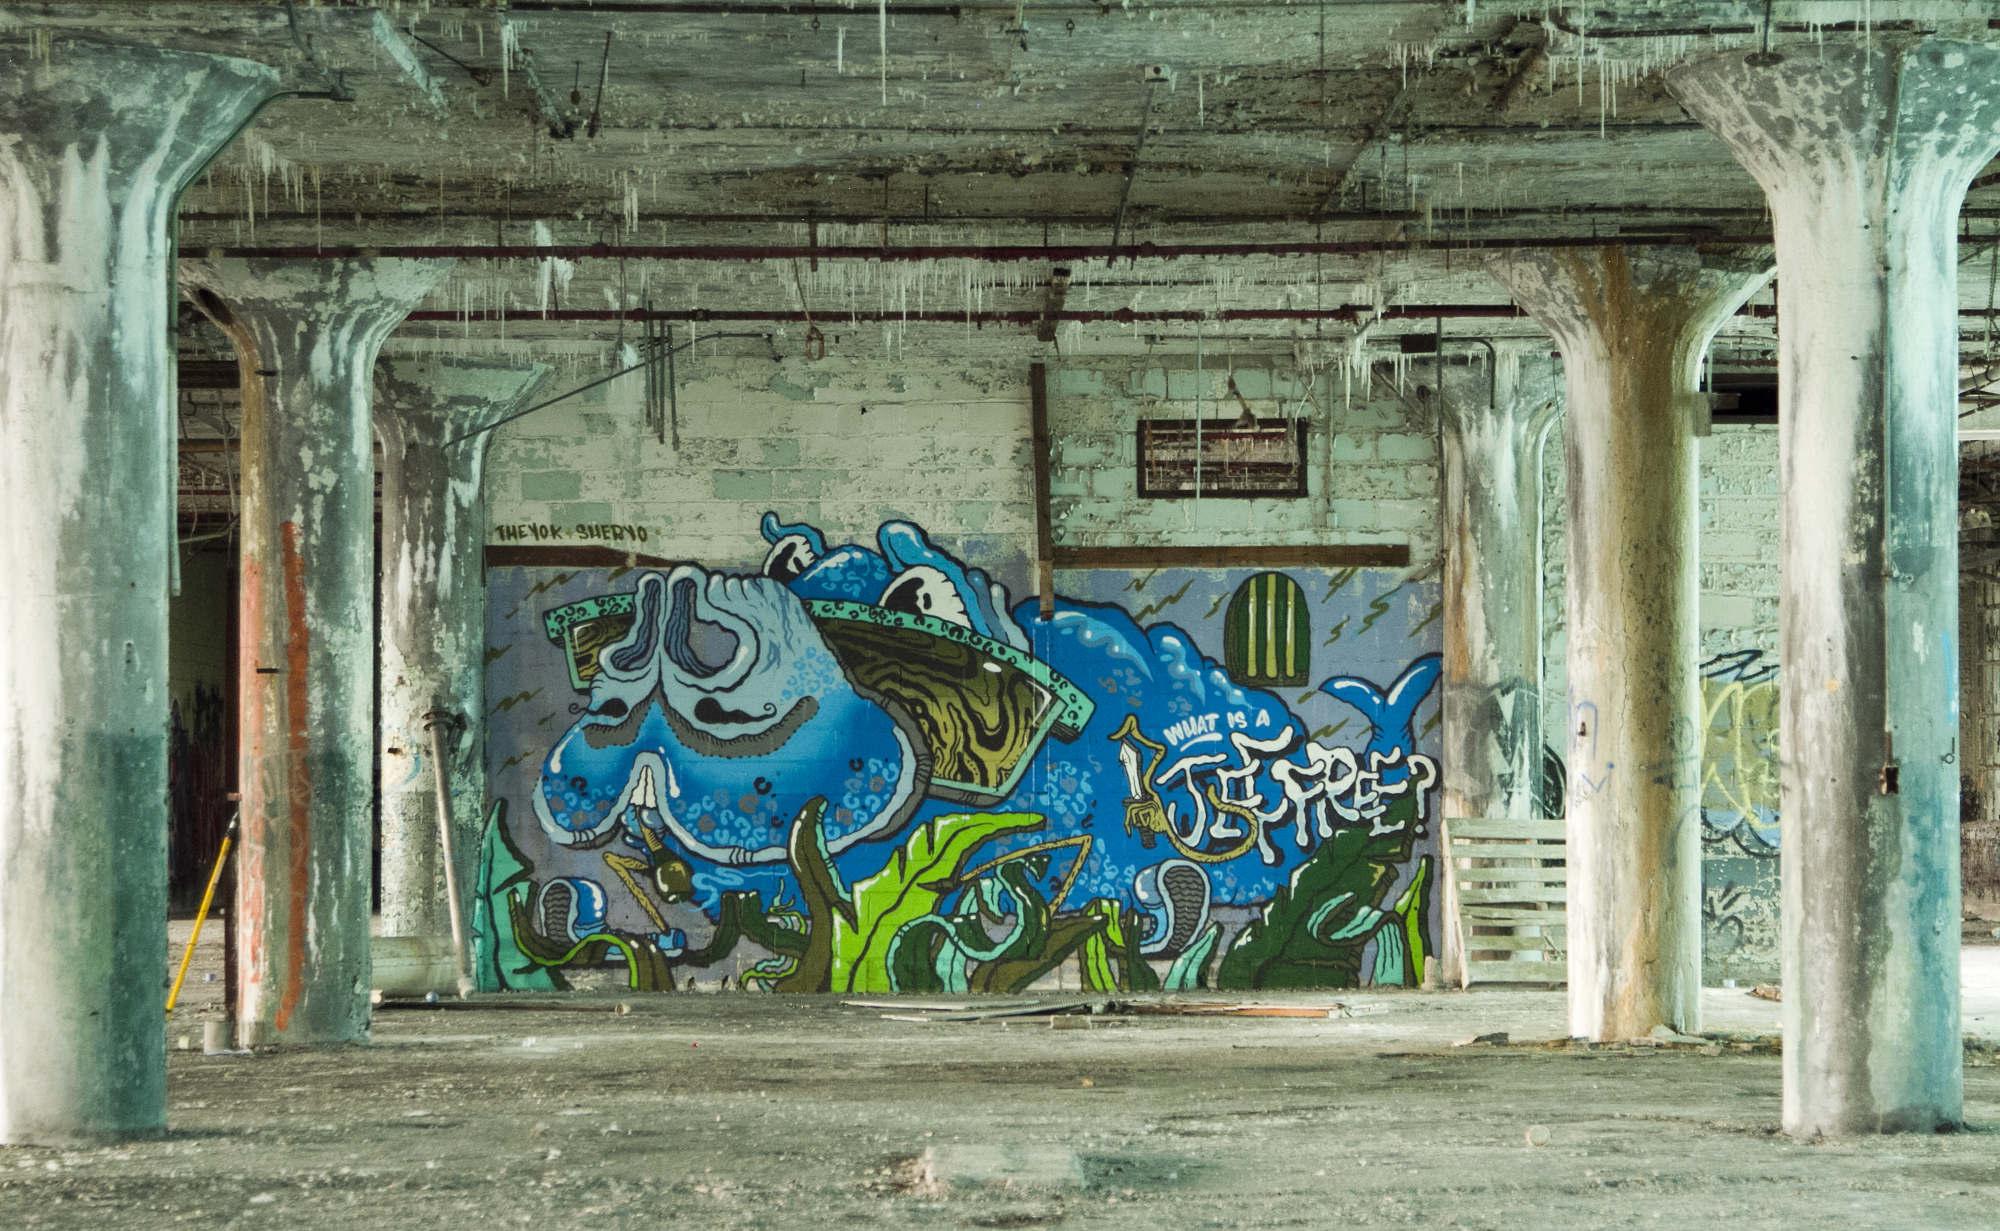 yok-sheryo-graffiti-cartoon-skateboard-1